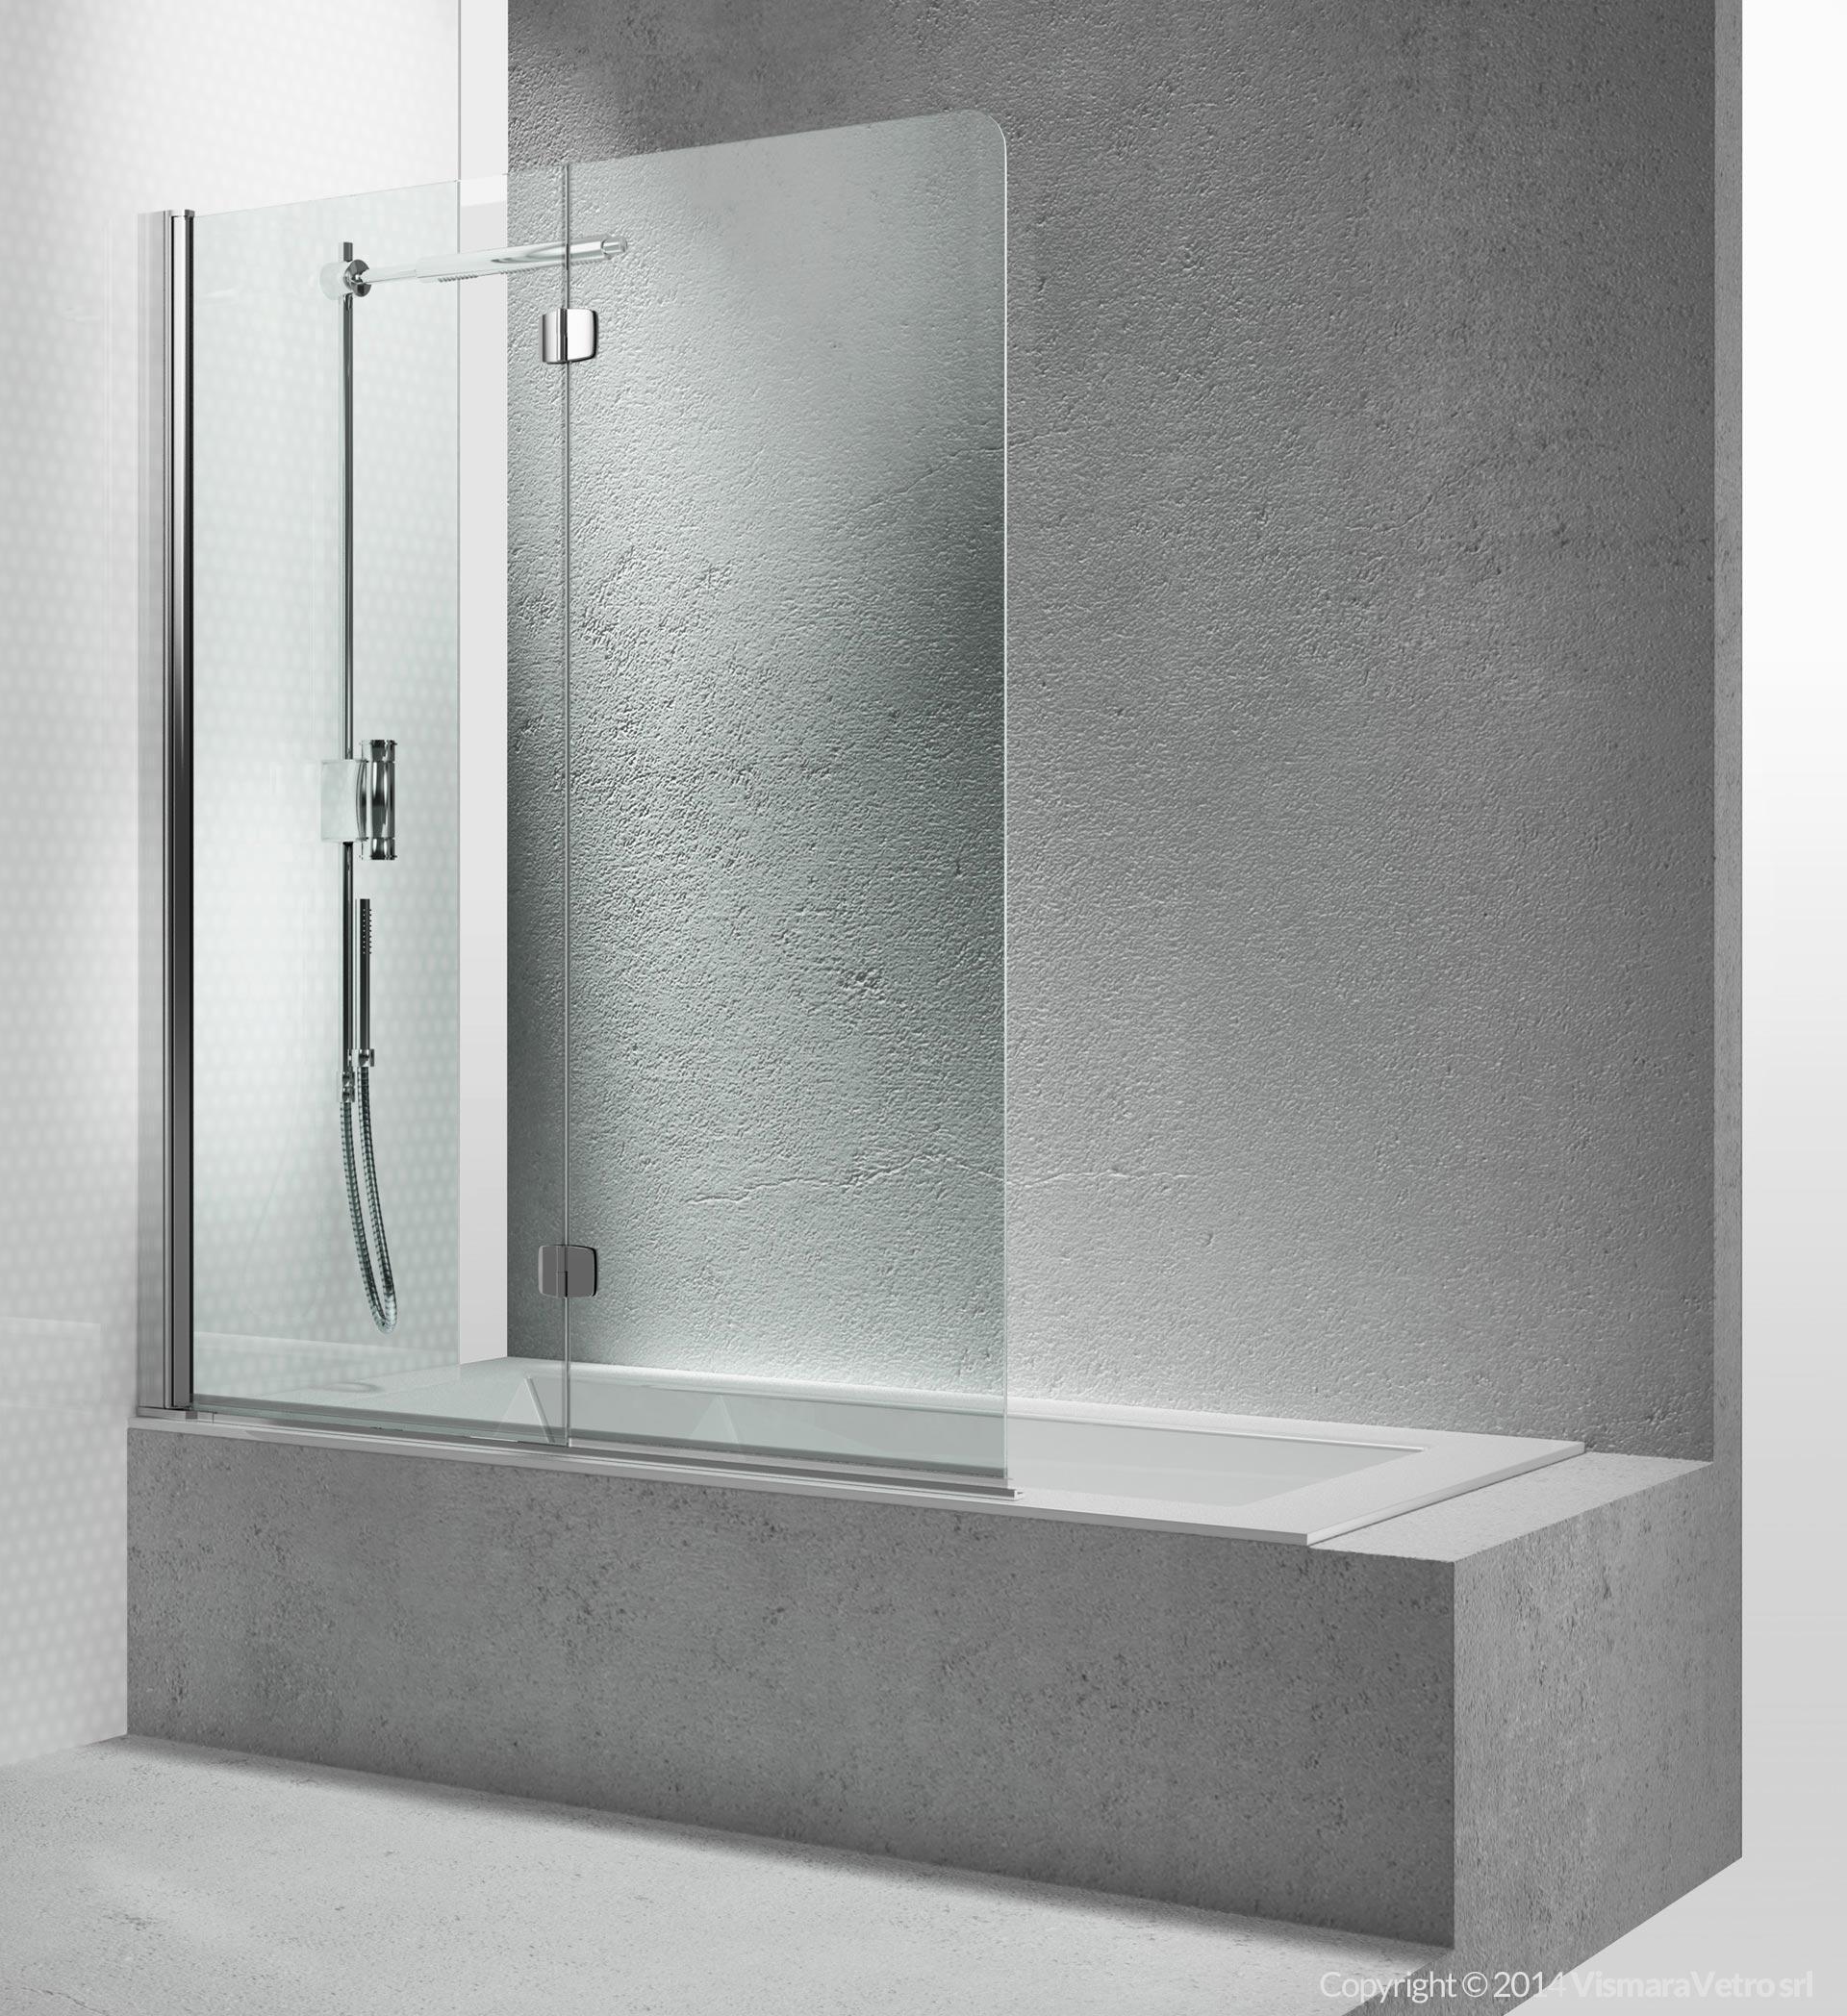 Vasche sv apertura pieghevole - Da doccia a vasca da bagno ...